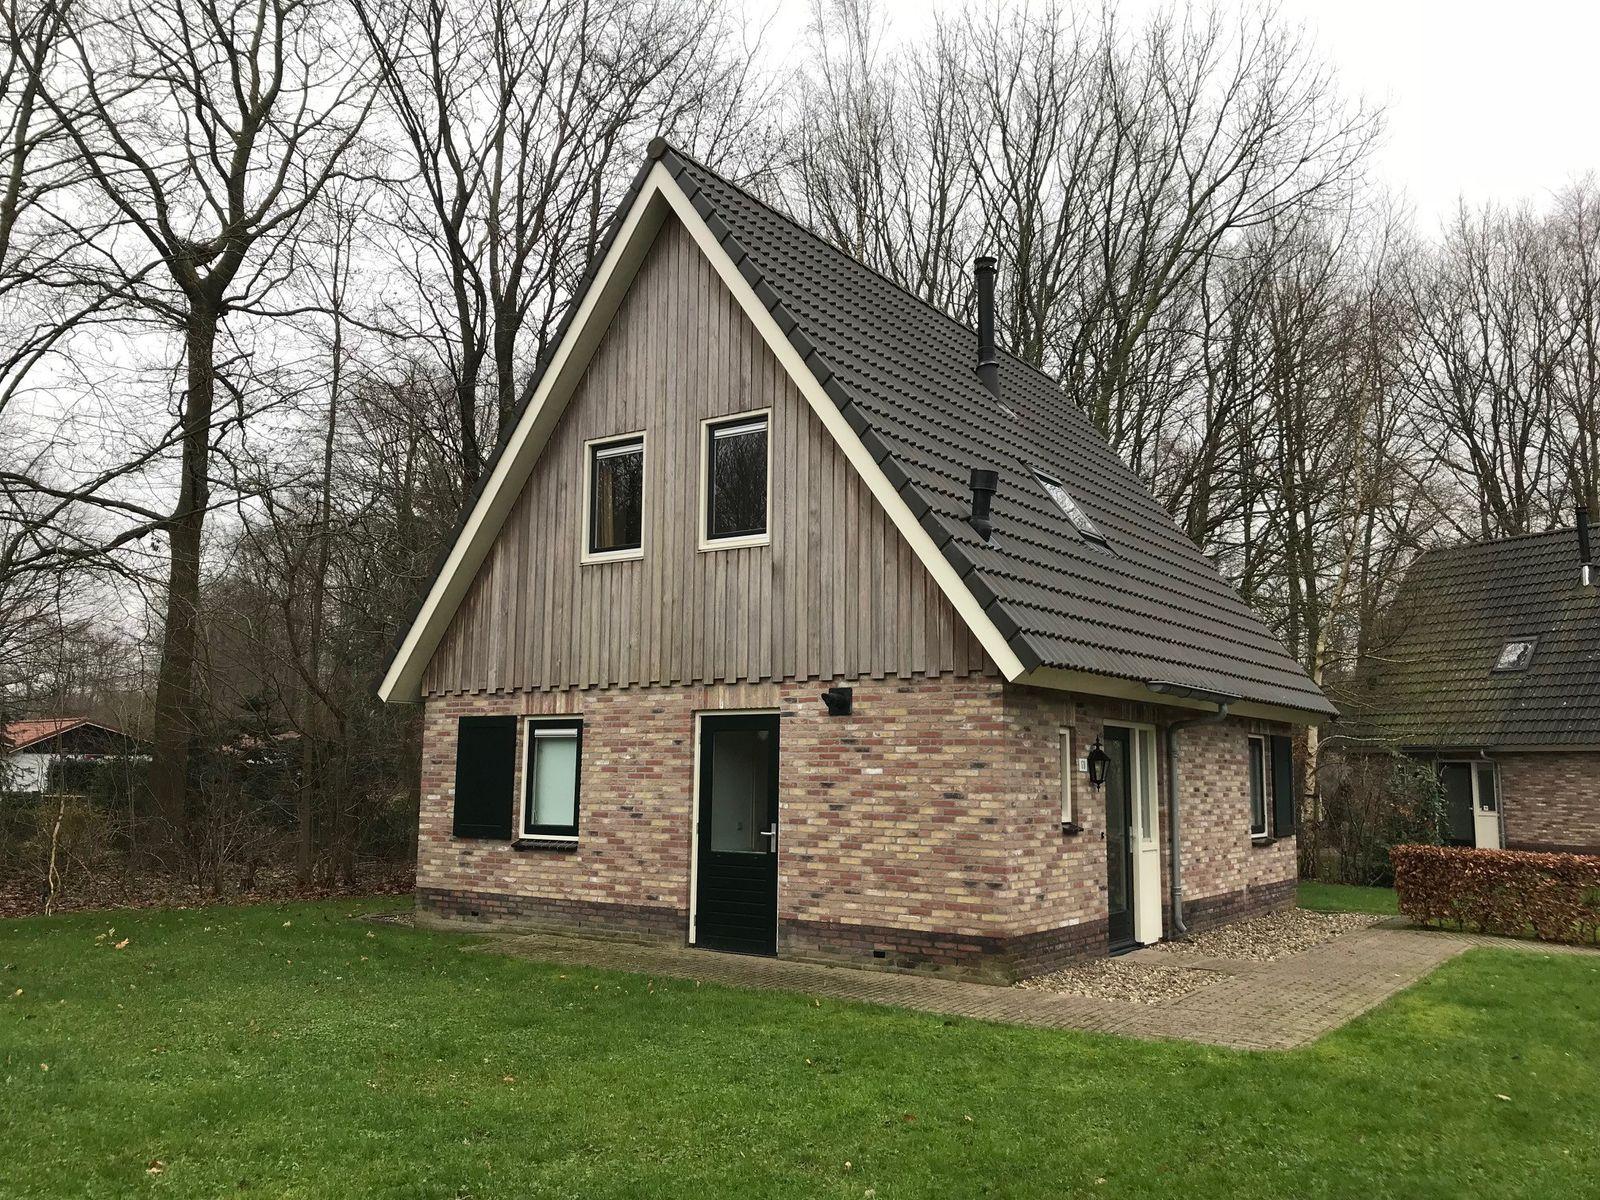 Valtherweg 36-169, Exloo